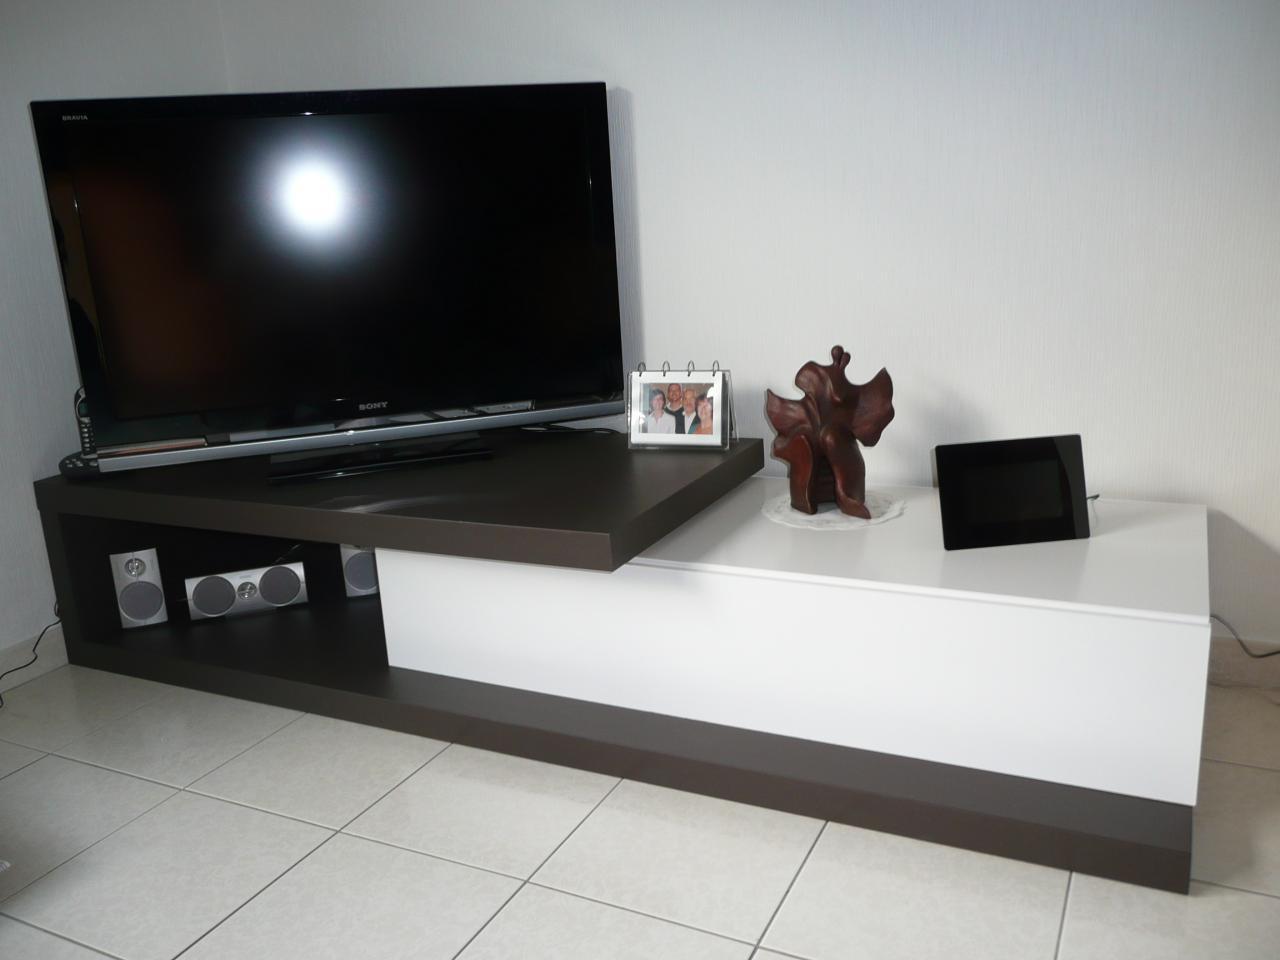 Meuble Tv Rotatif Hubfrdesign Co # Meuble Tv Rotatif